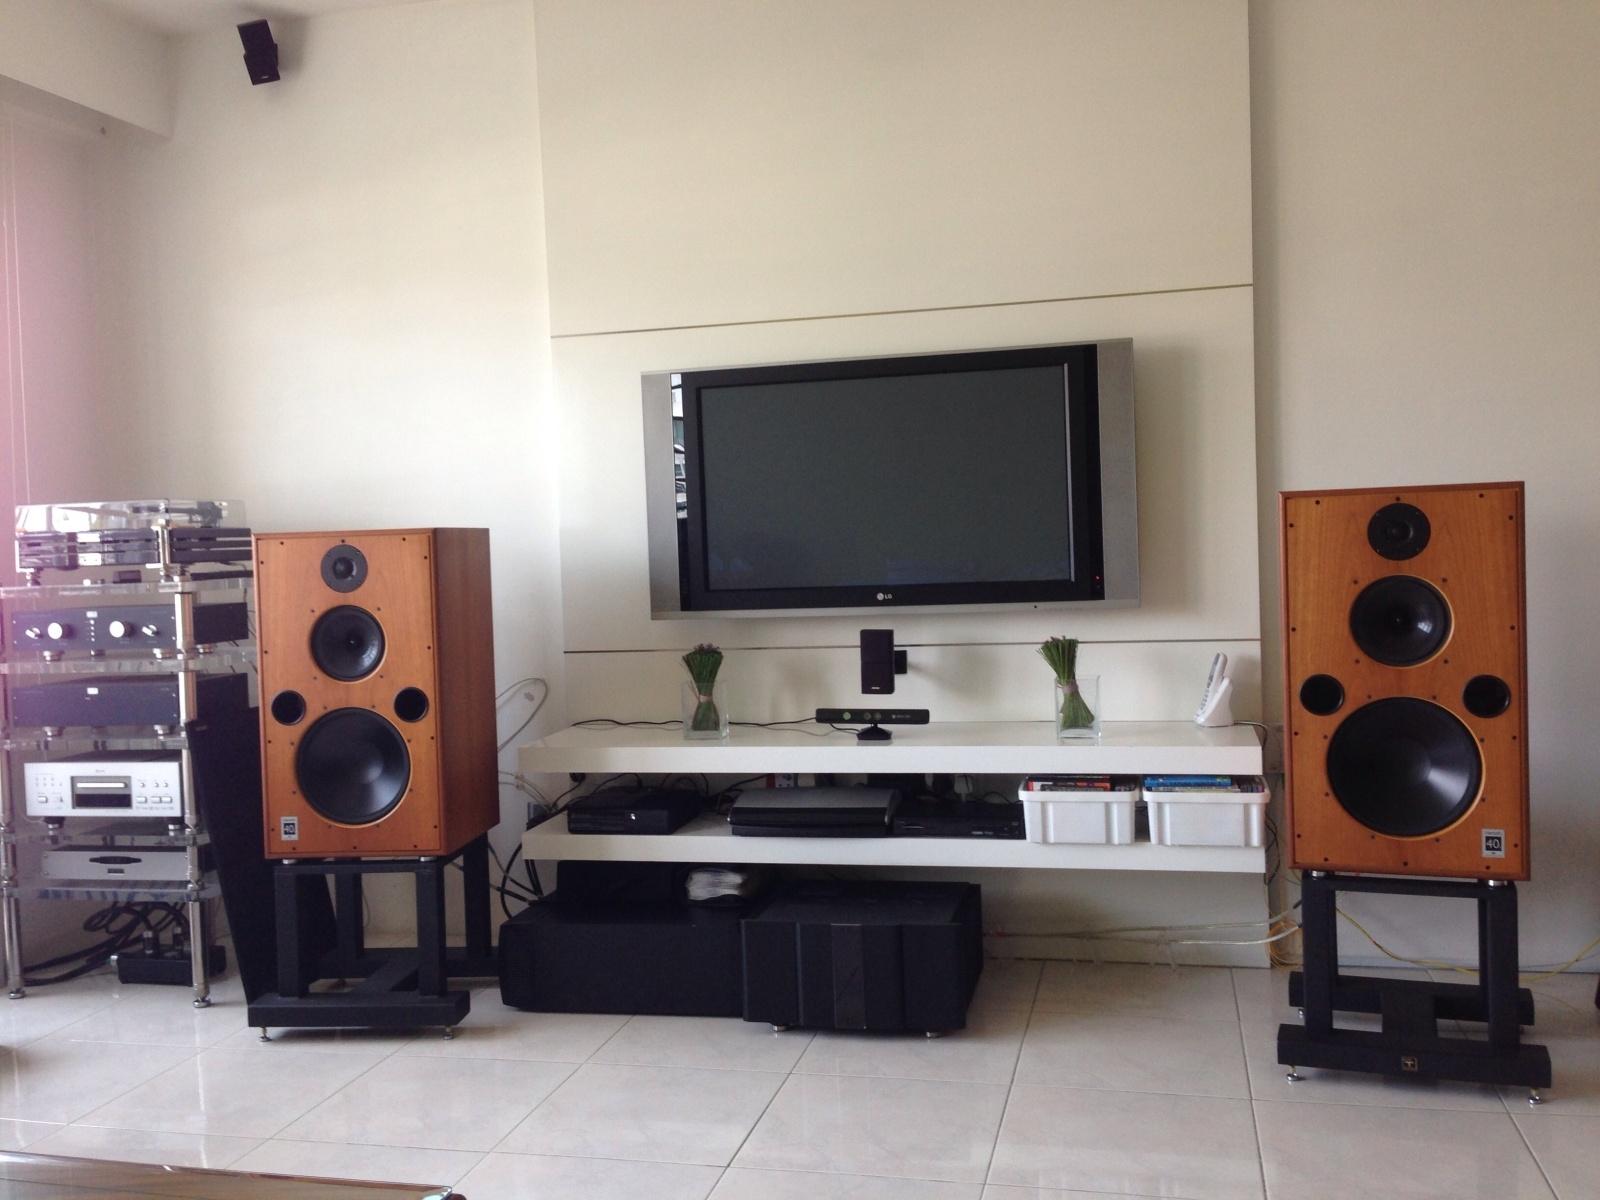 Harbeth Monitor 40.1 & KAS600